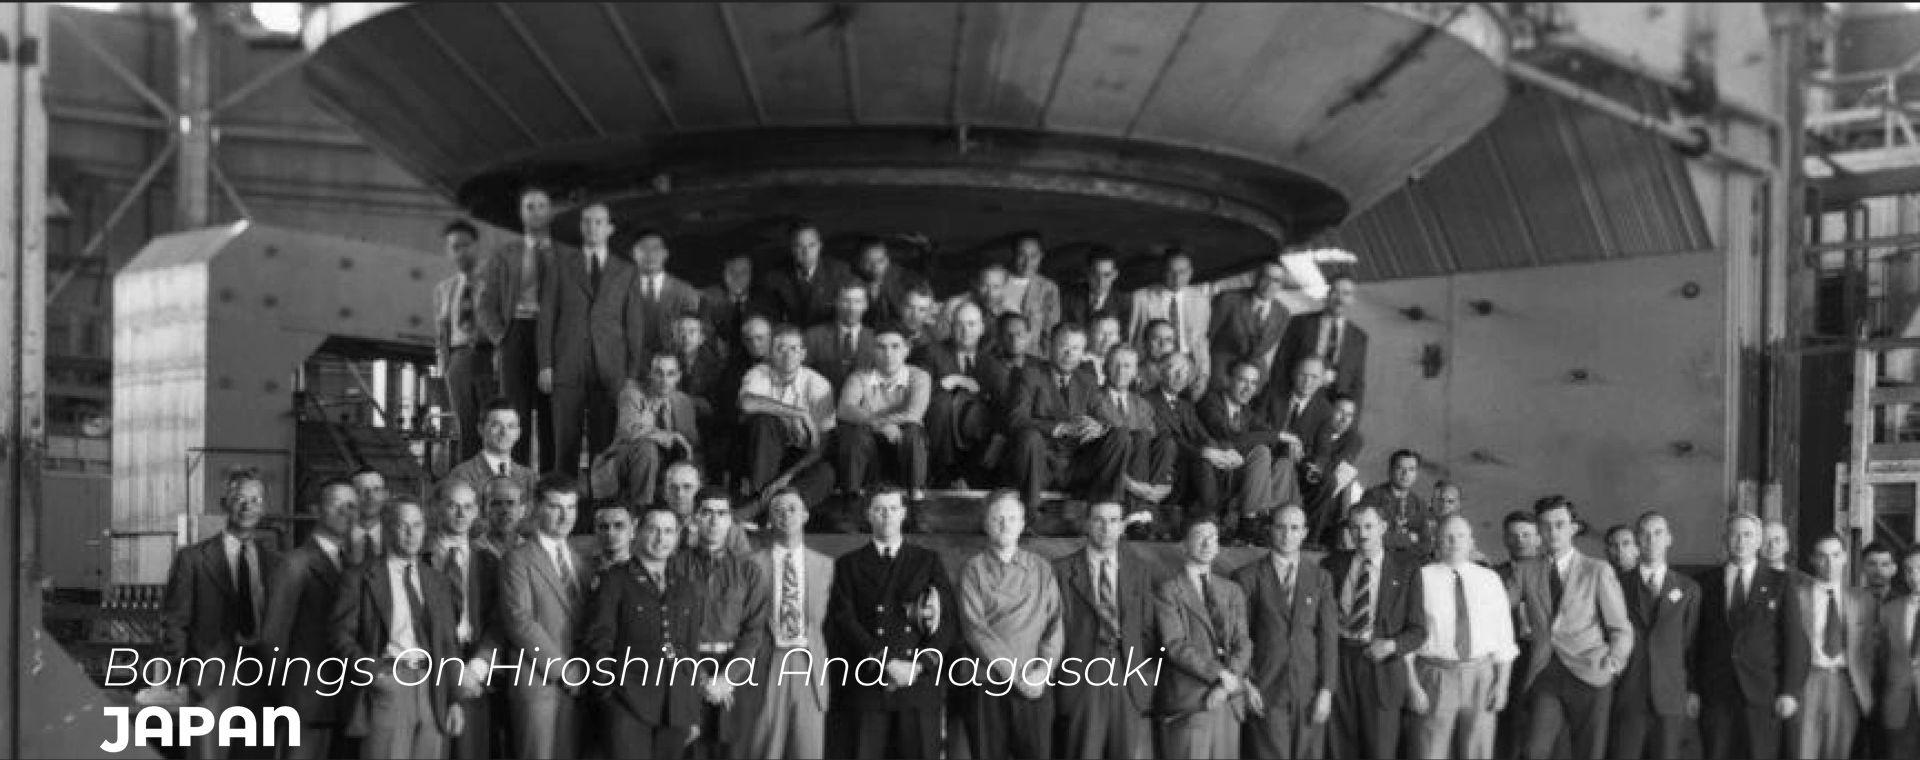 BOMBINGS ON HIROSHIMA AND NAGASAKI